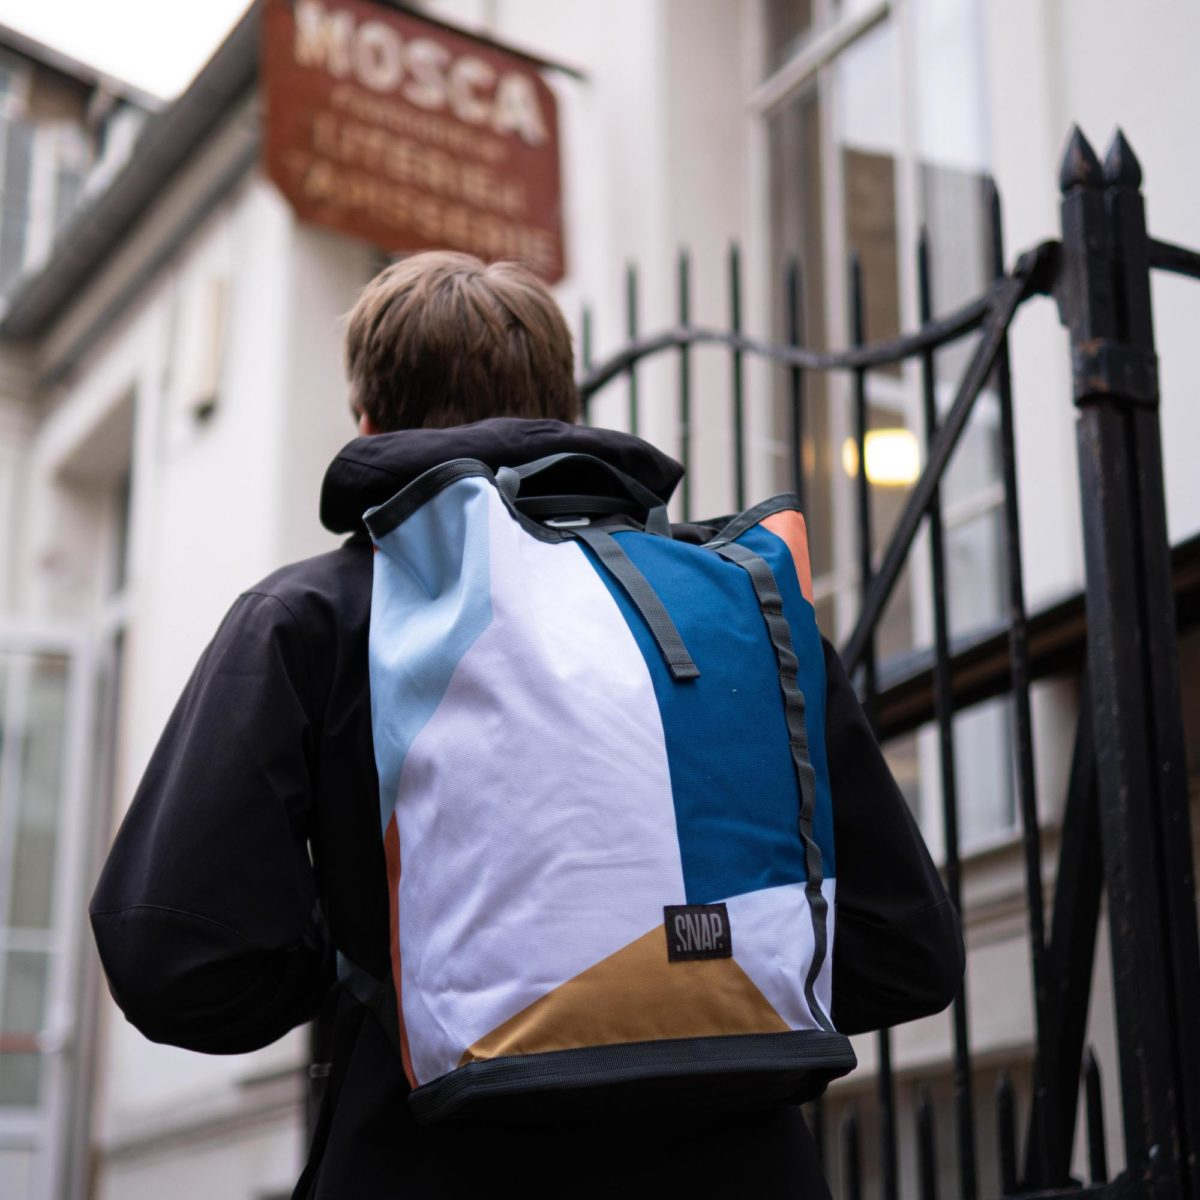 eco-friendly backpack severine dietrich